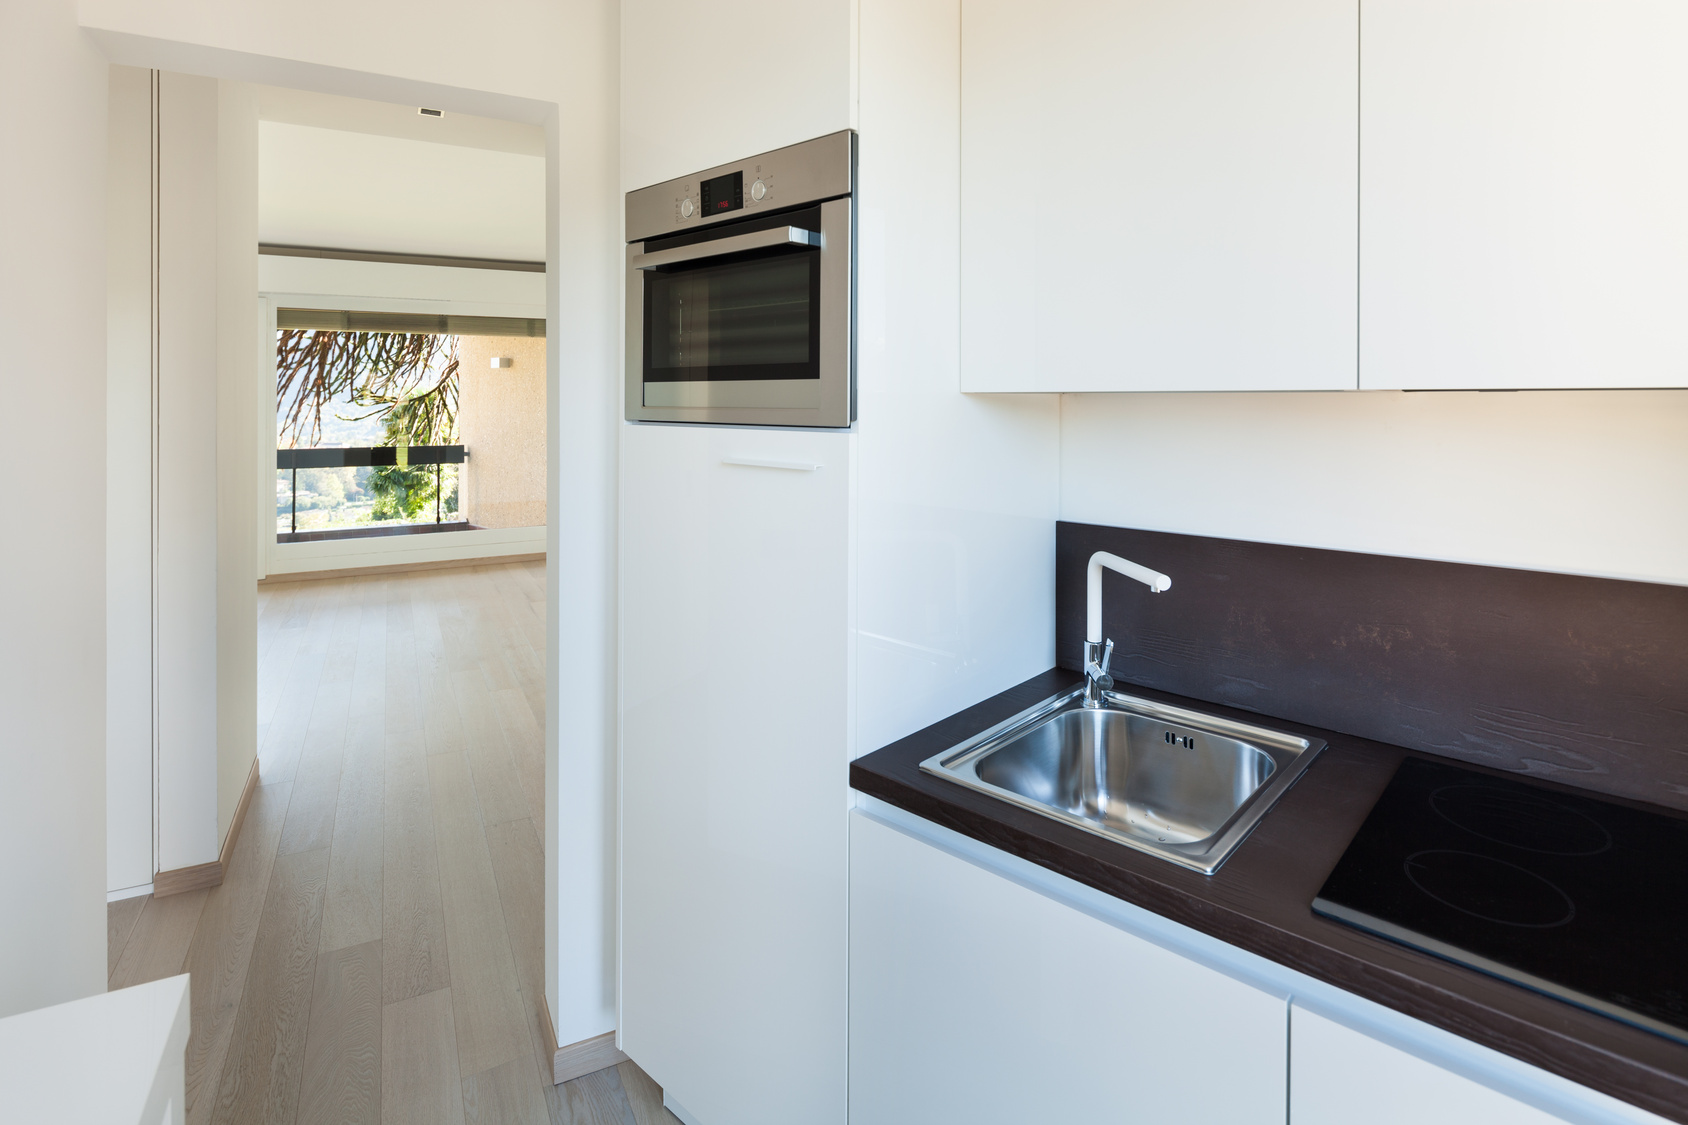 Full Size of Interiors Building, Modern Apartment, Kitchen View Küche Ikea Miniküche